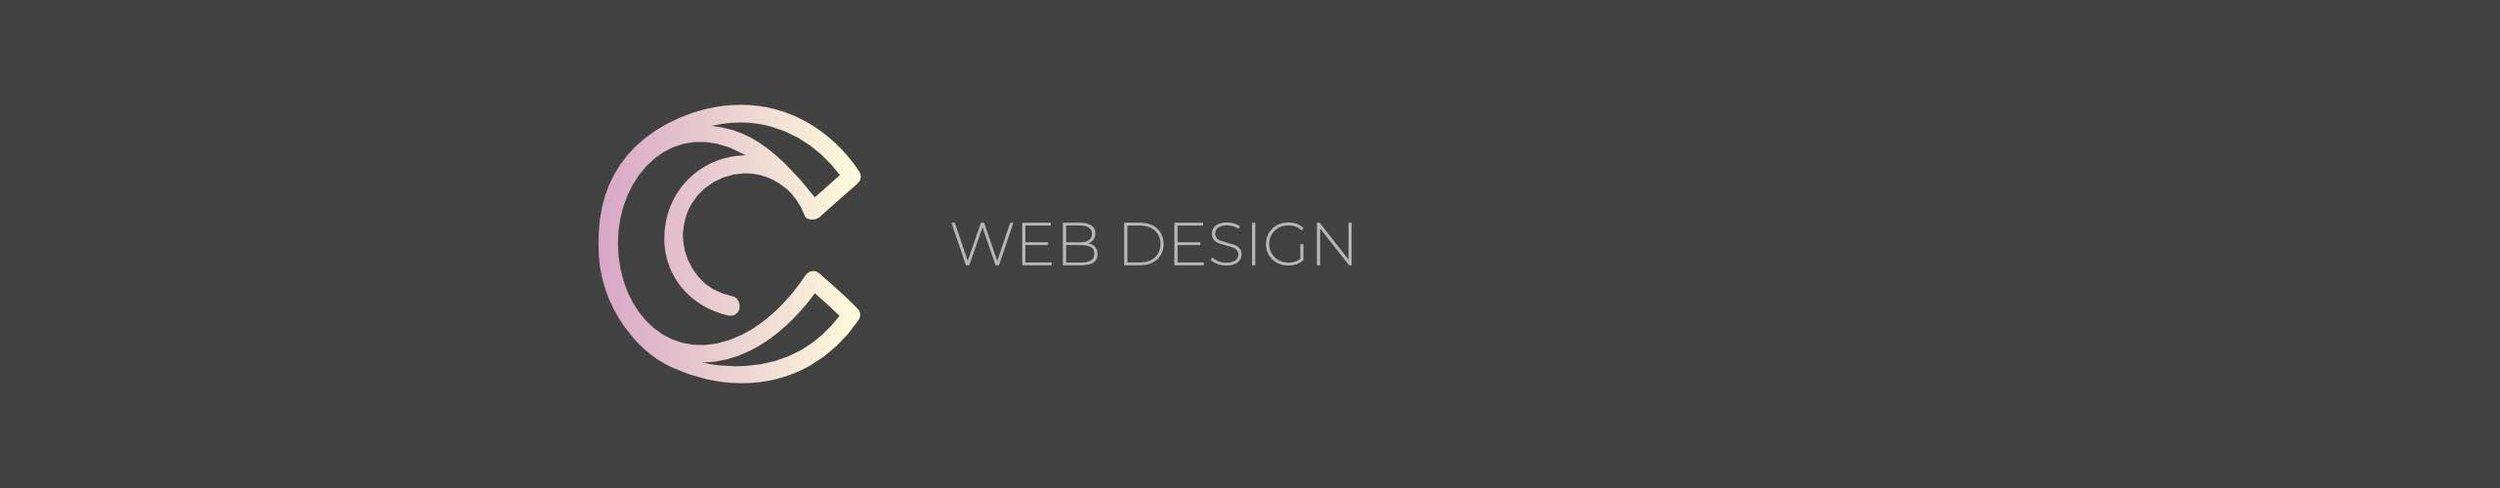 the-creative-co-web-design-banner.jpg